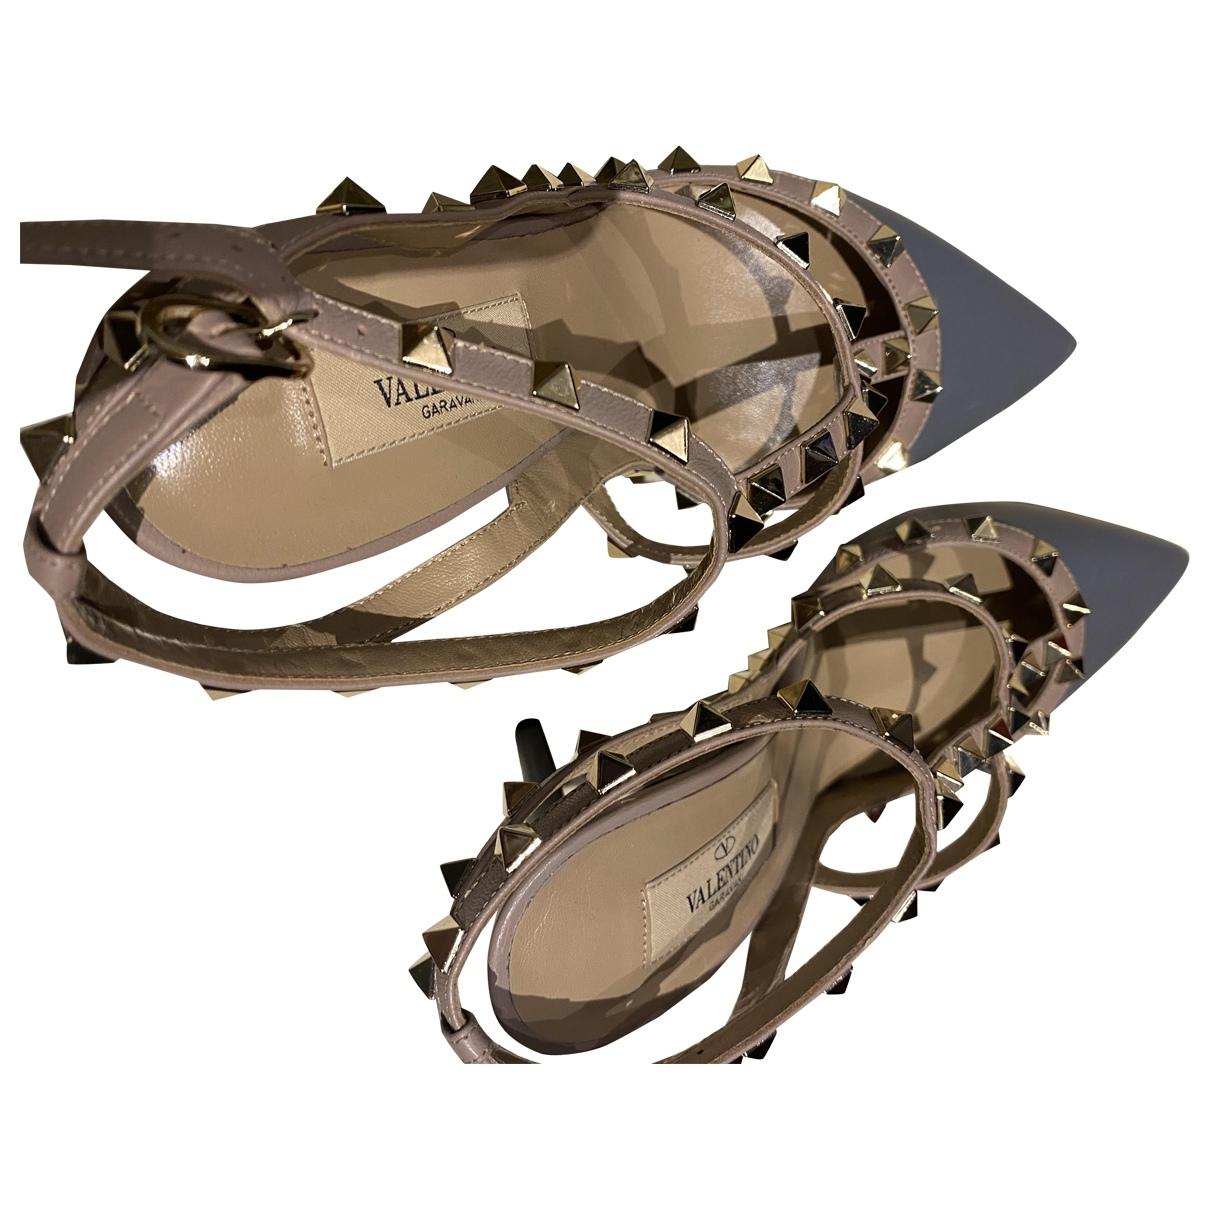 Valentino Garavani Rockstud Multicolour Leather Heels for Women 37.5 EU